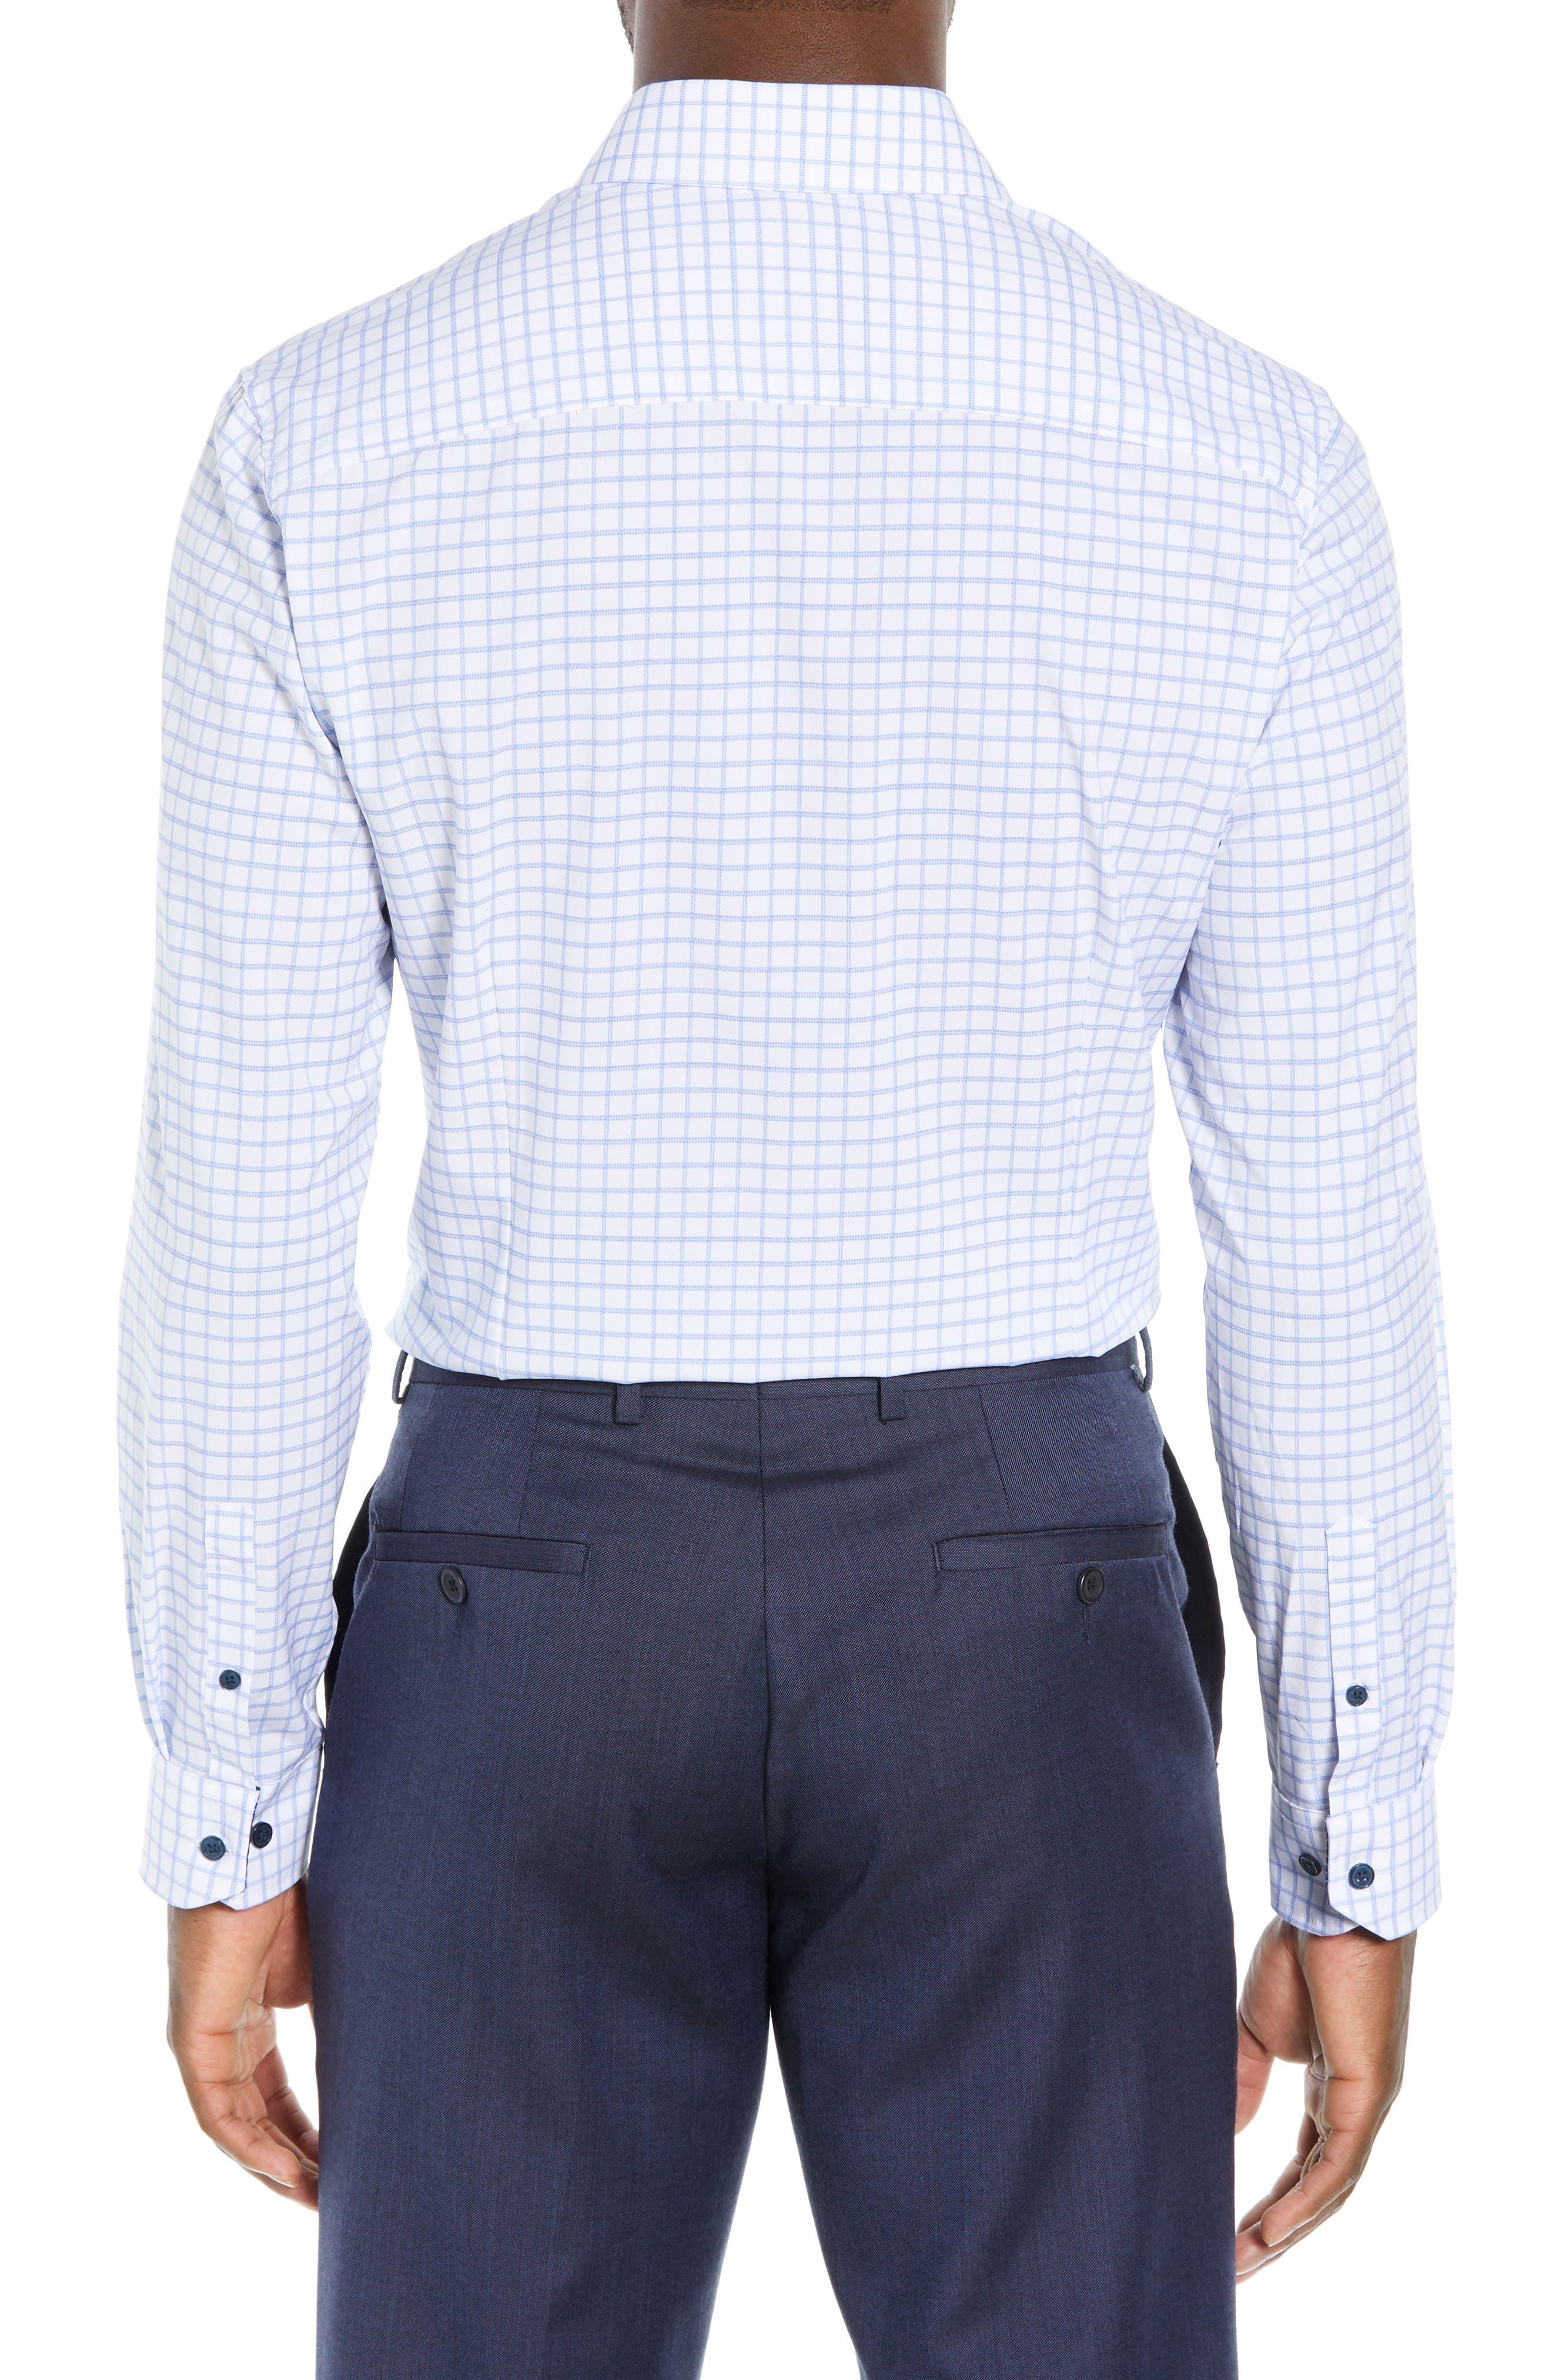 Trim Fit 4-Way Stretch Check Dress Shirt,                             Alternate thumbnail 3, color,                             WHITE